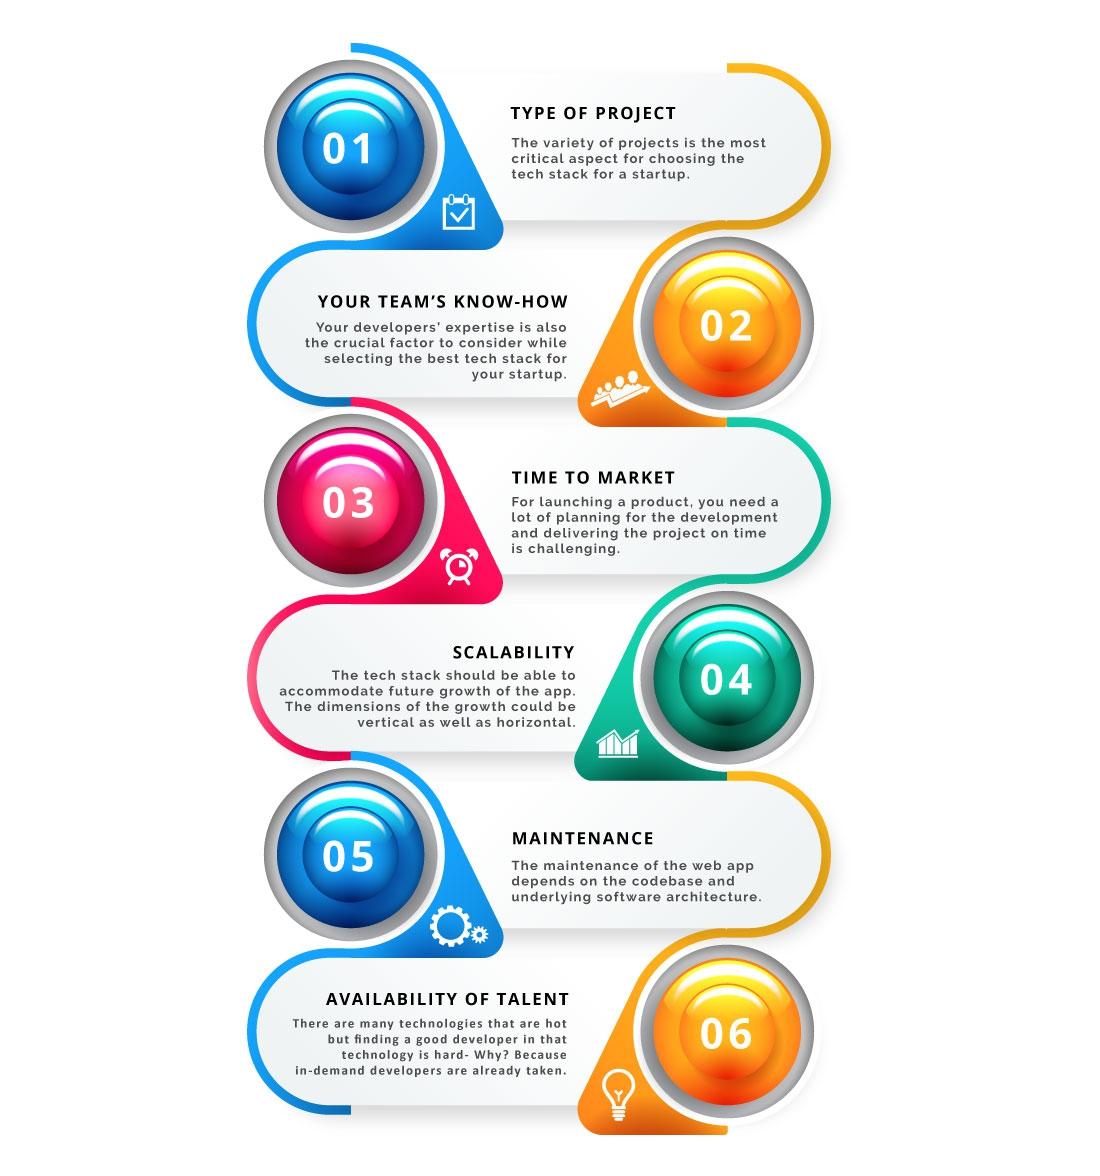 Factors to Choose Best Tech Stacks